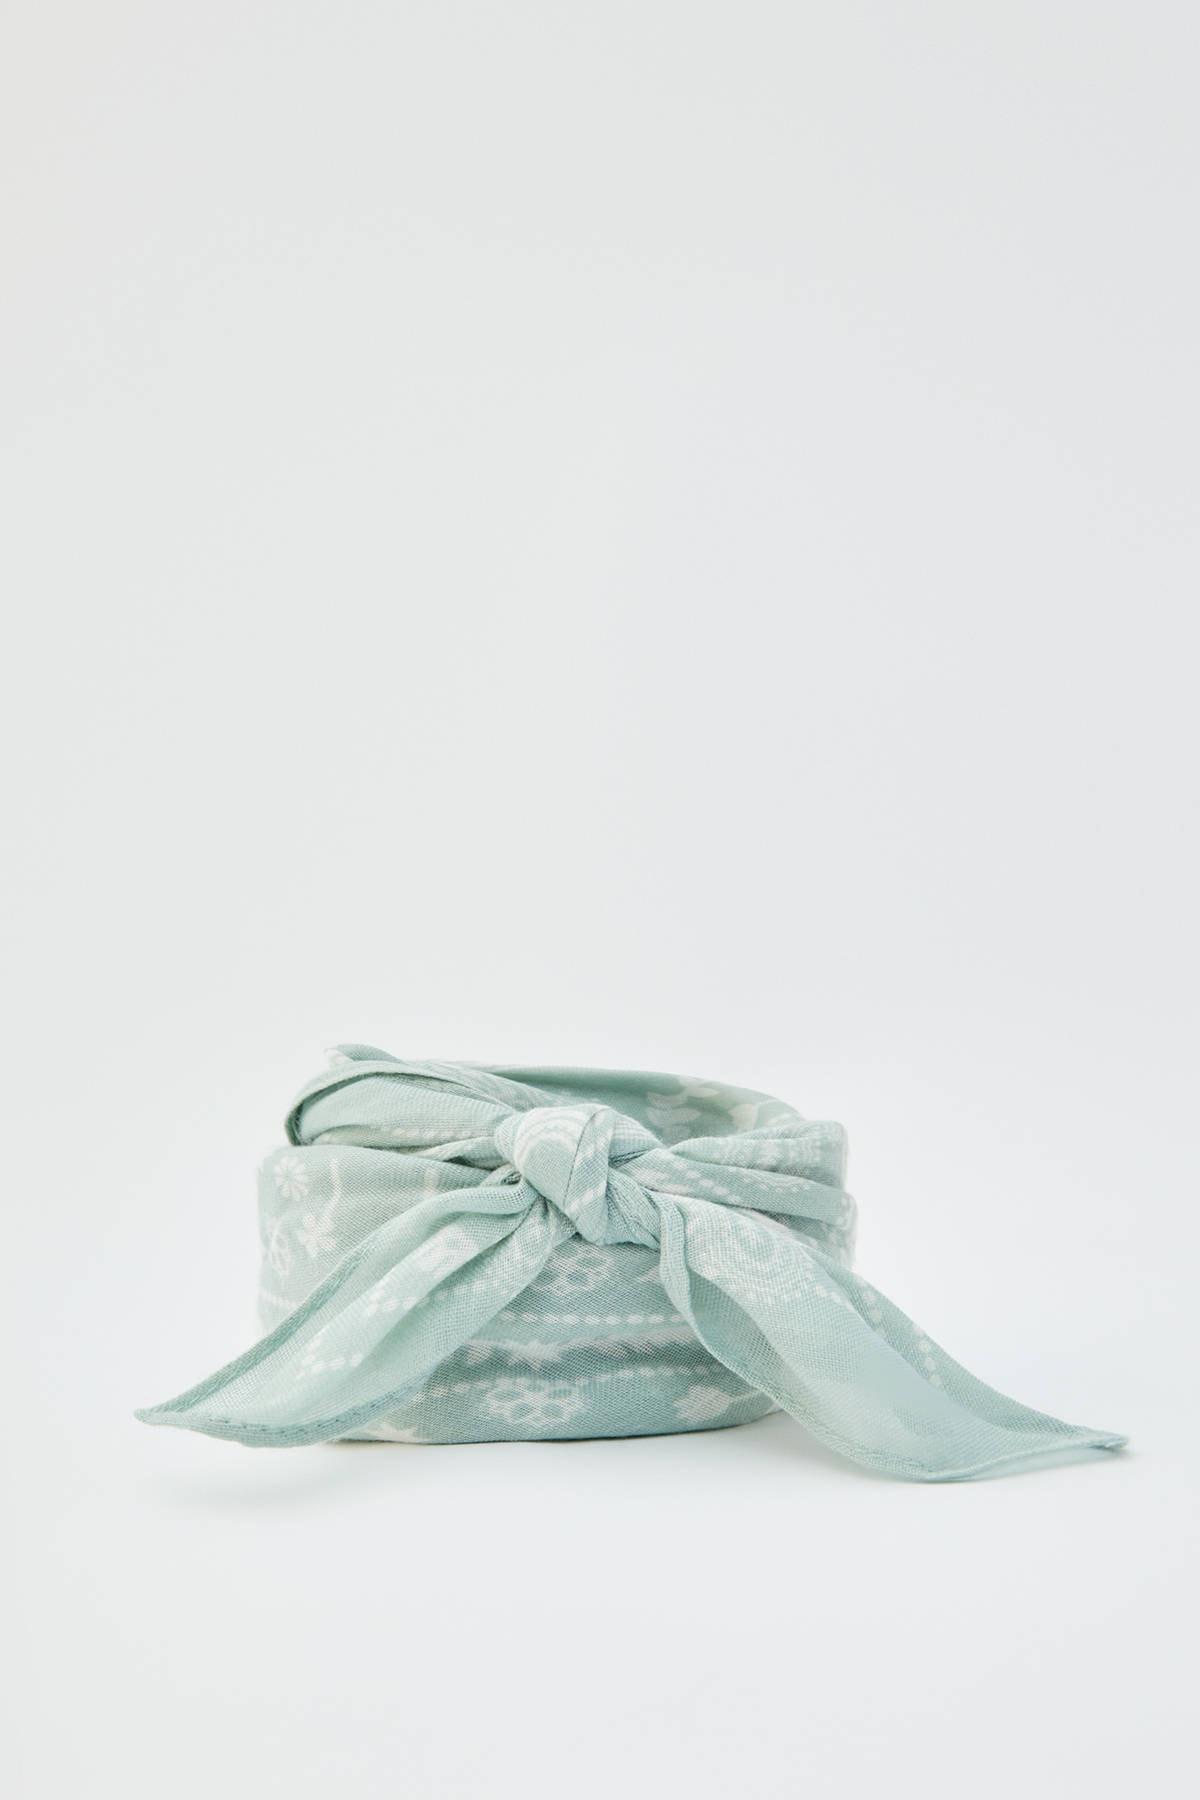 Pull & Bear Kadın Su Yeşili Pastel Renkli Klasik Bandana 09842302